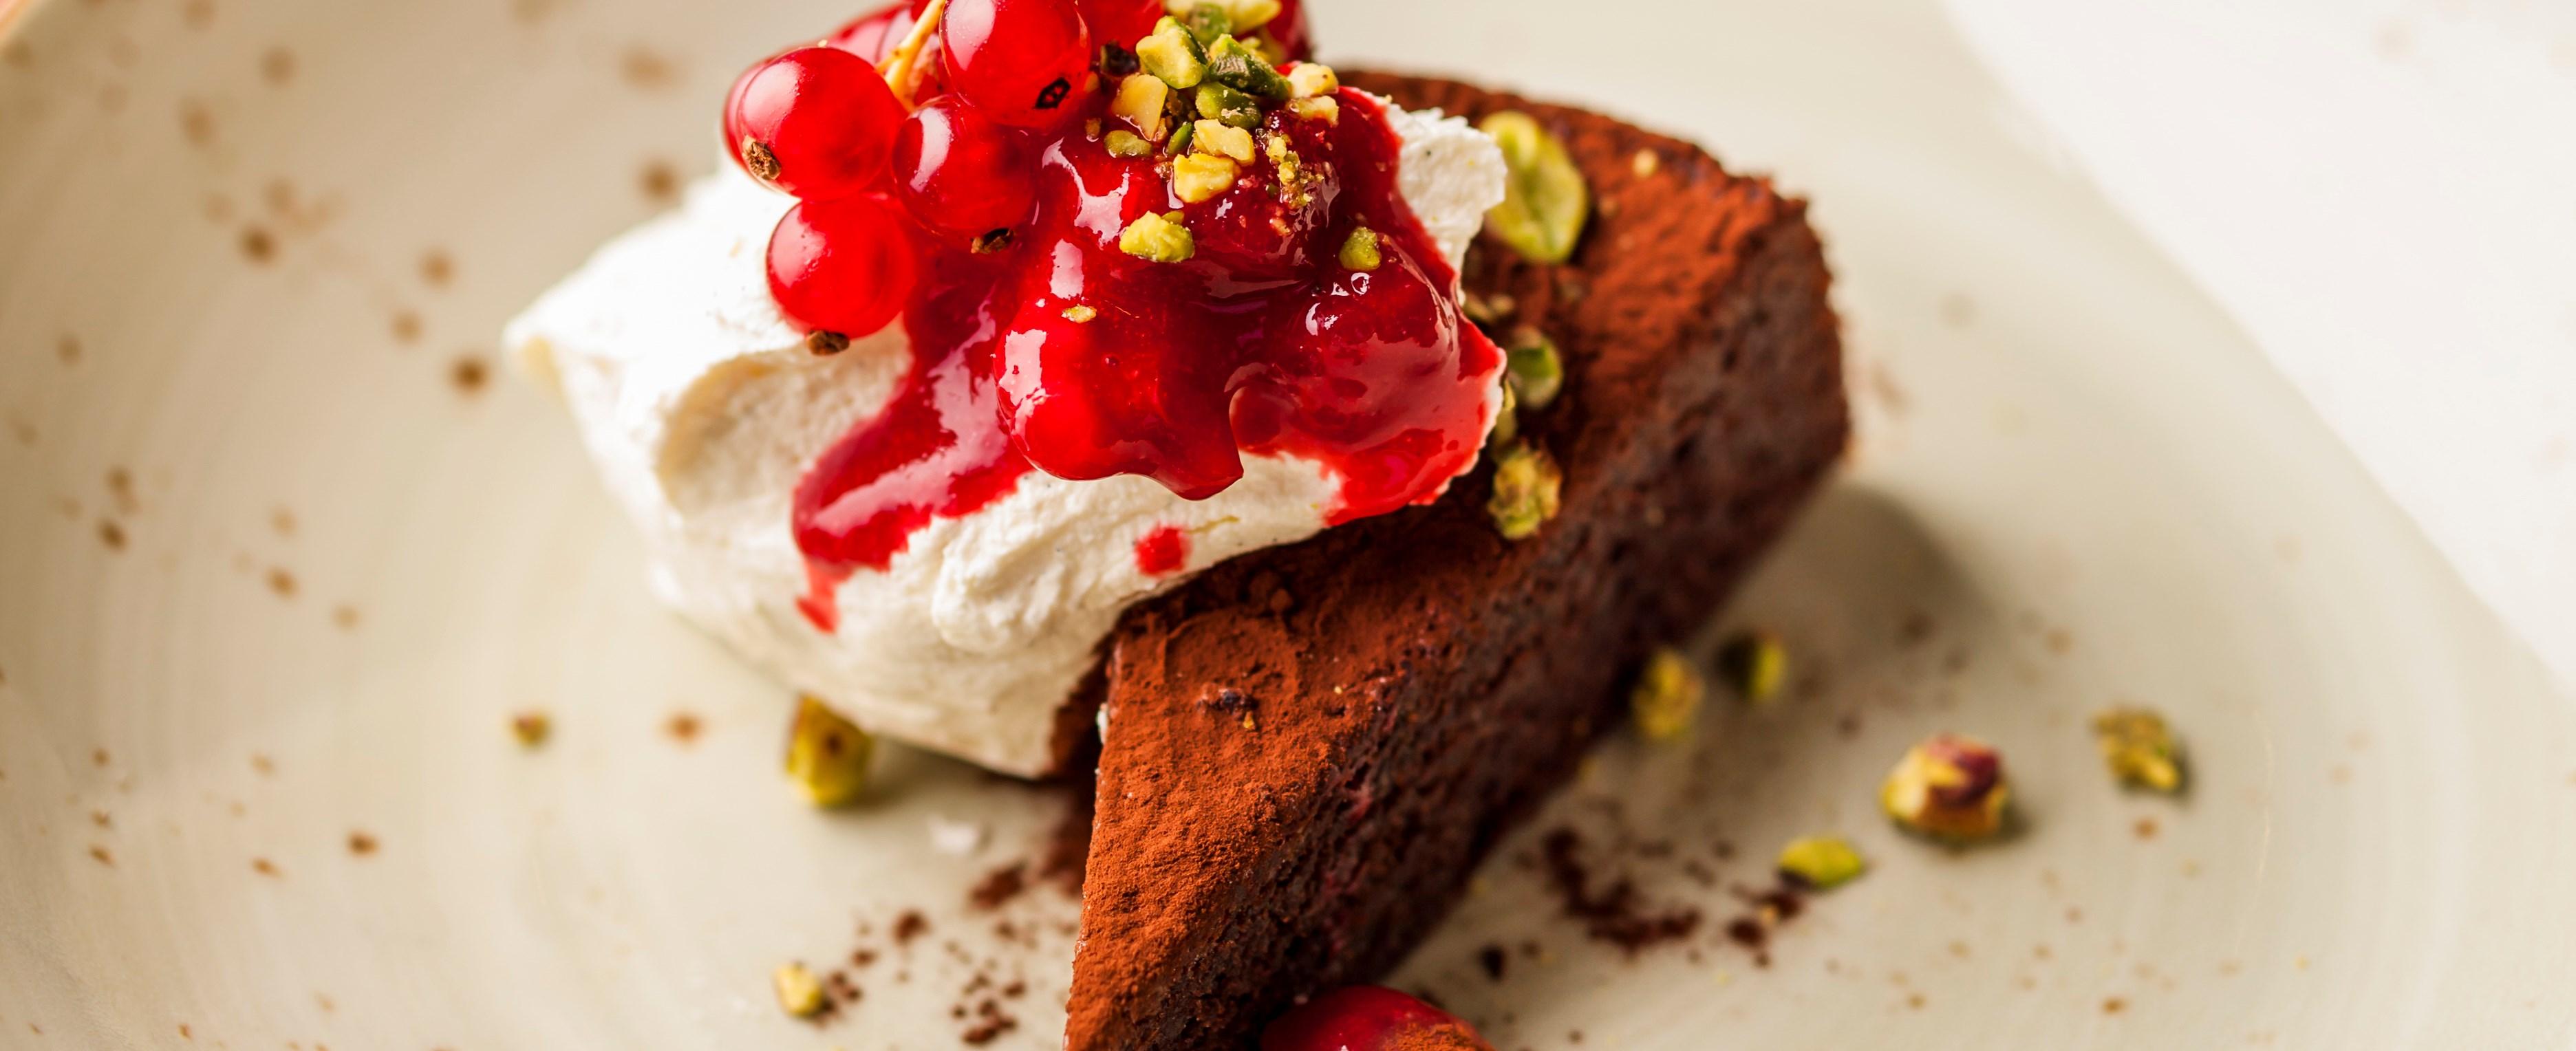 Best ever chocolate pudding recipes - Flourless chocolate cake (caprese)